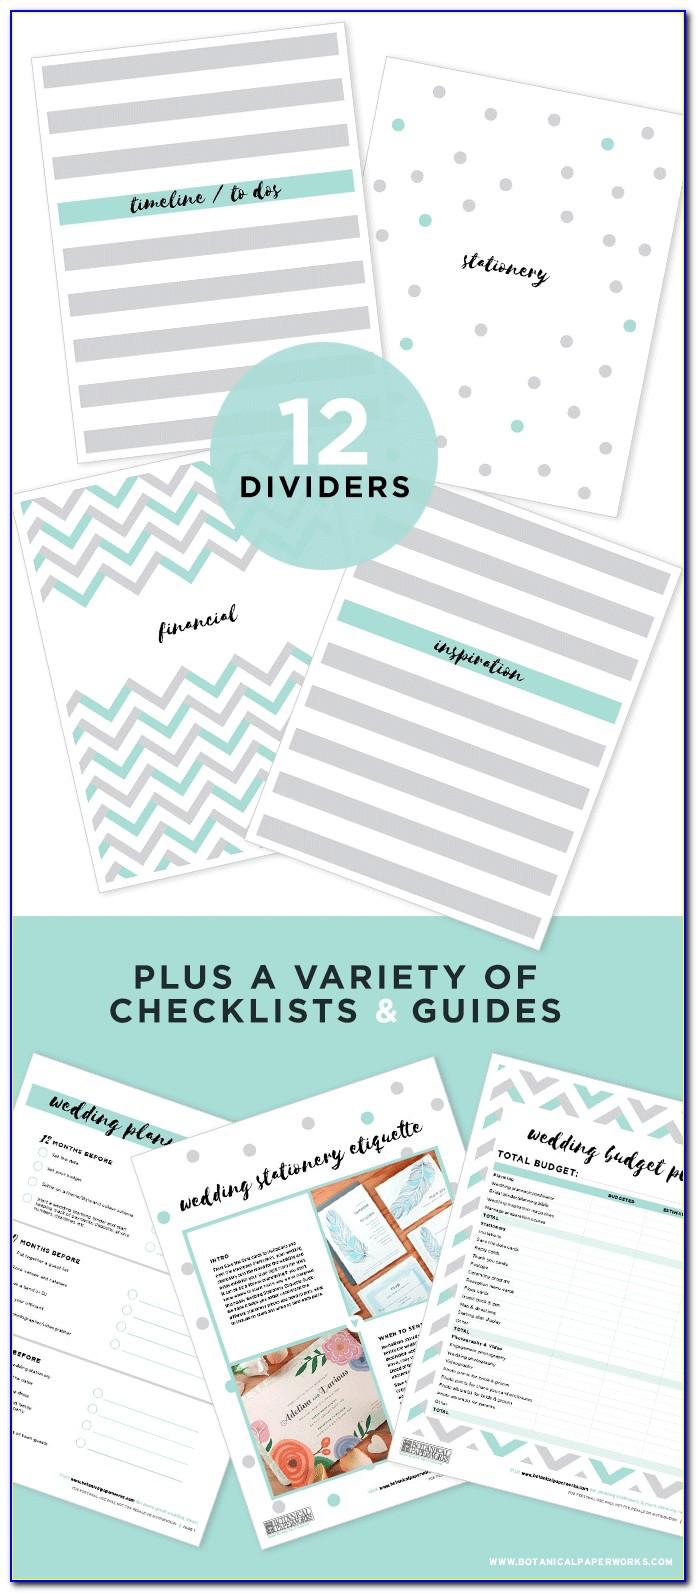 Free Wedding Planner Checklist Printable